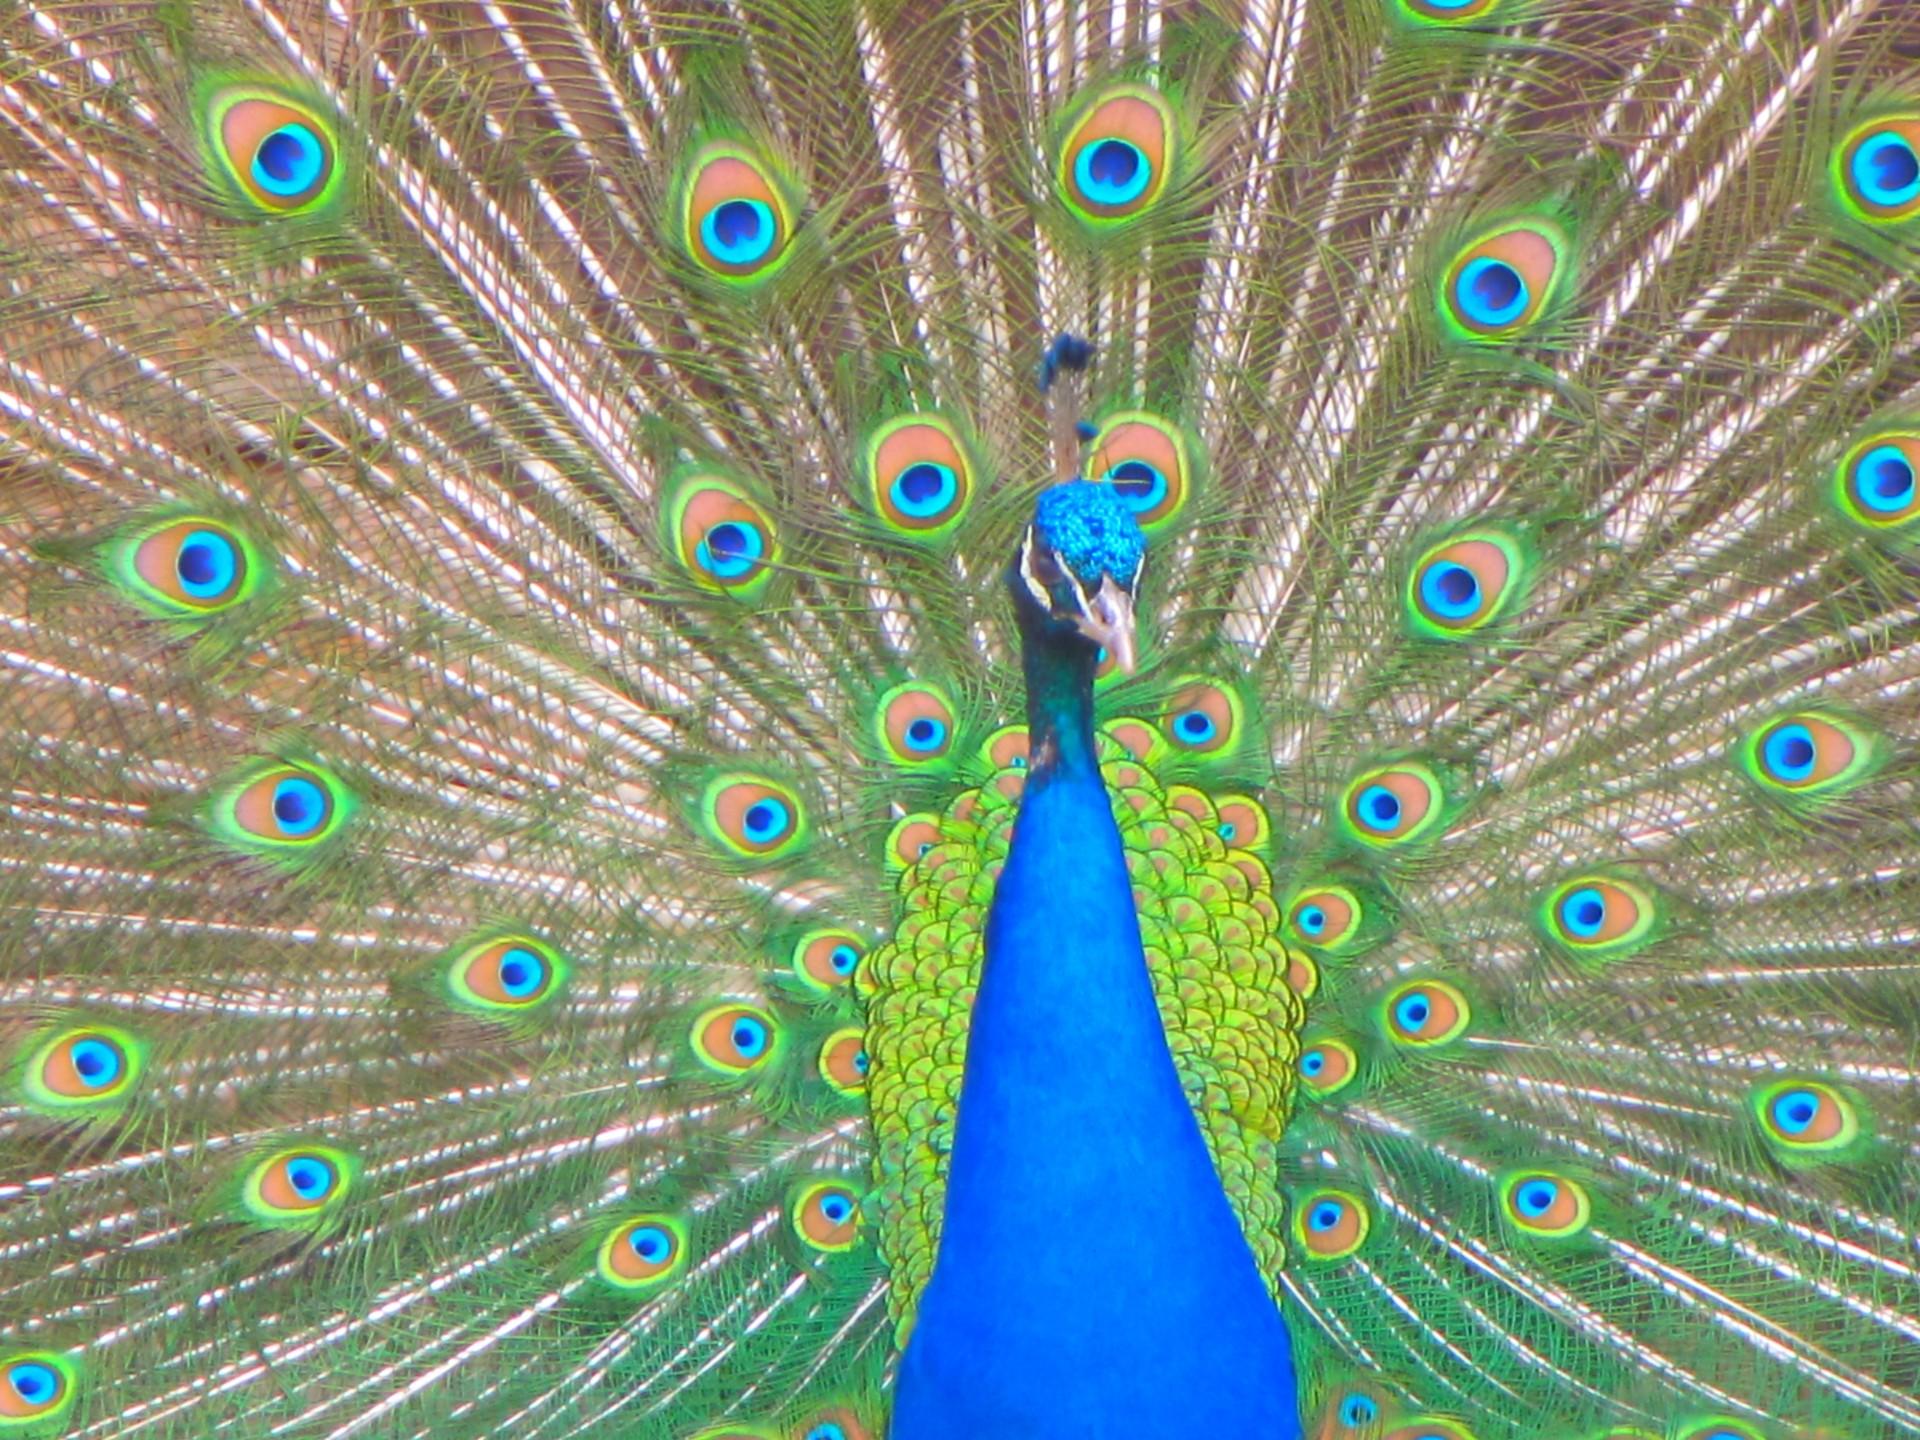 Le Paon Qui Fait La Roue bird,peacock,tail,color,green - free image from needpix